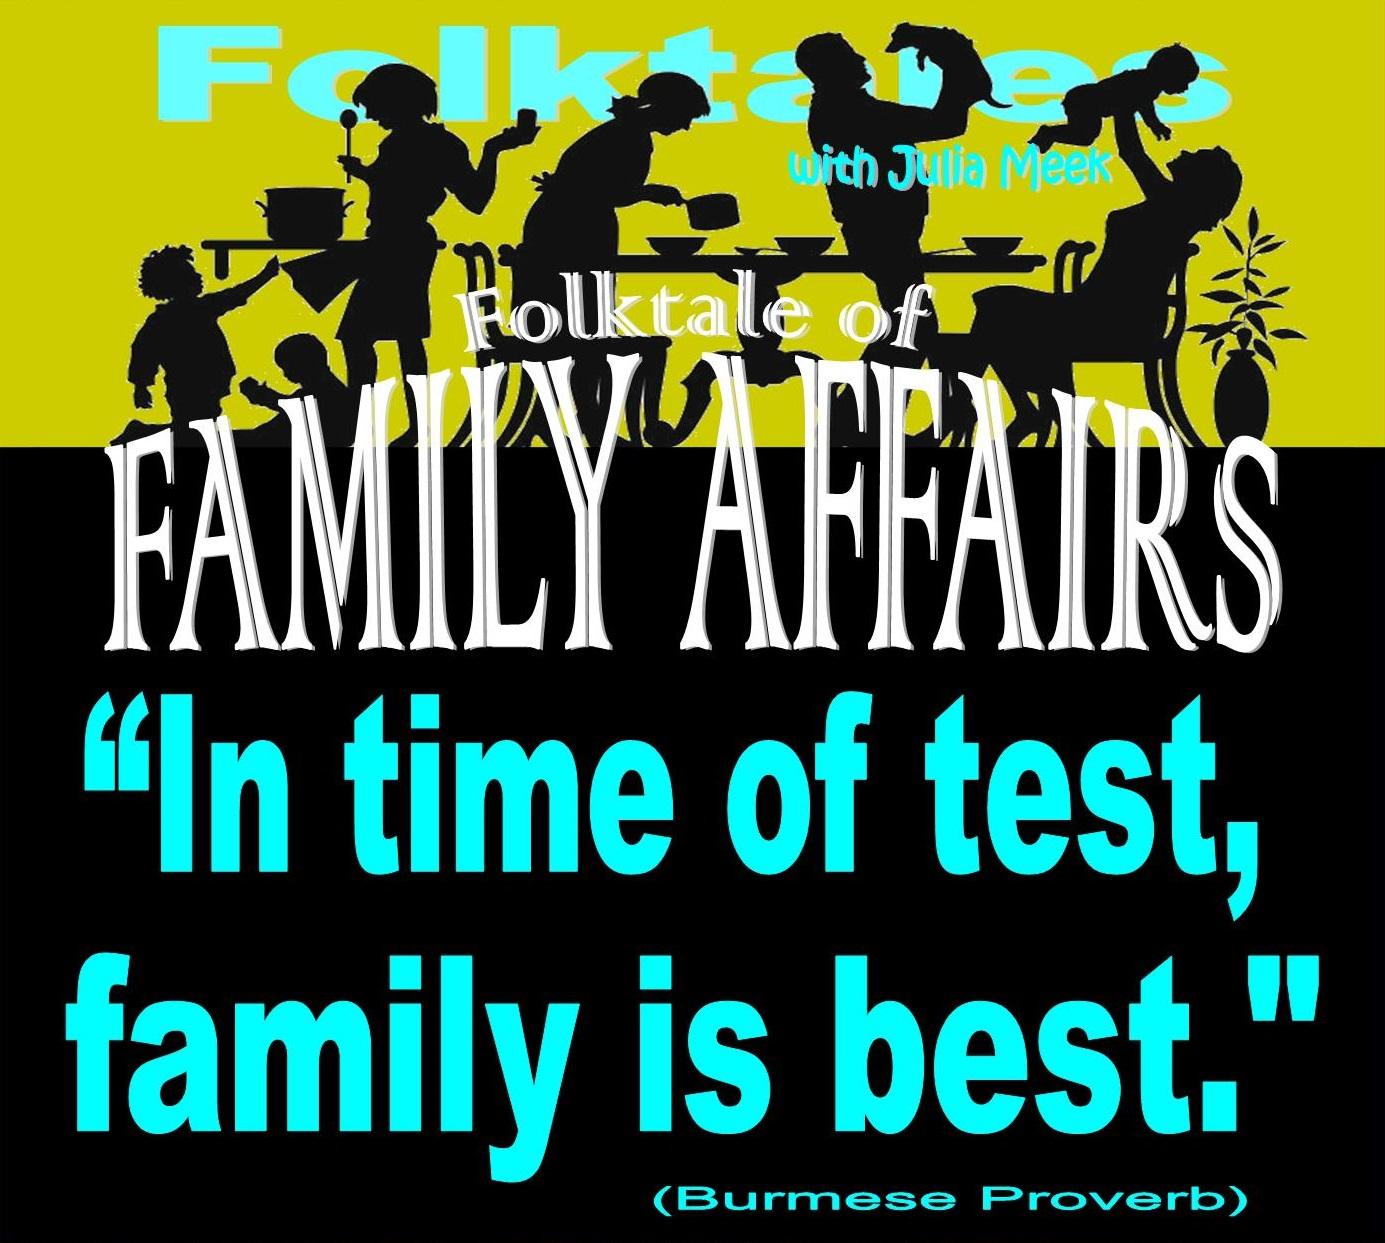 Caption: The Folktale of Family Affairs, Credit: Julia Meek